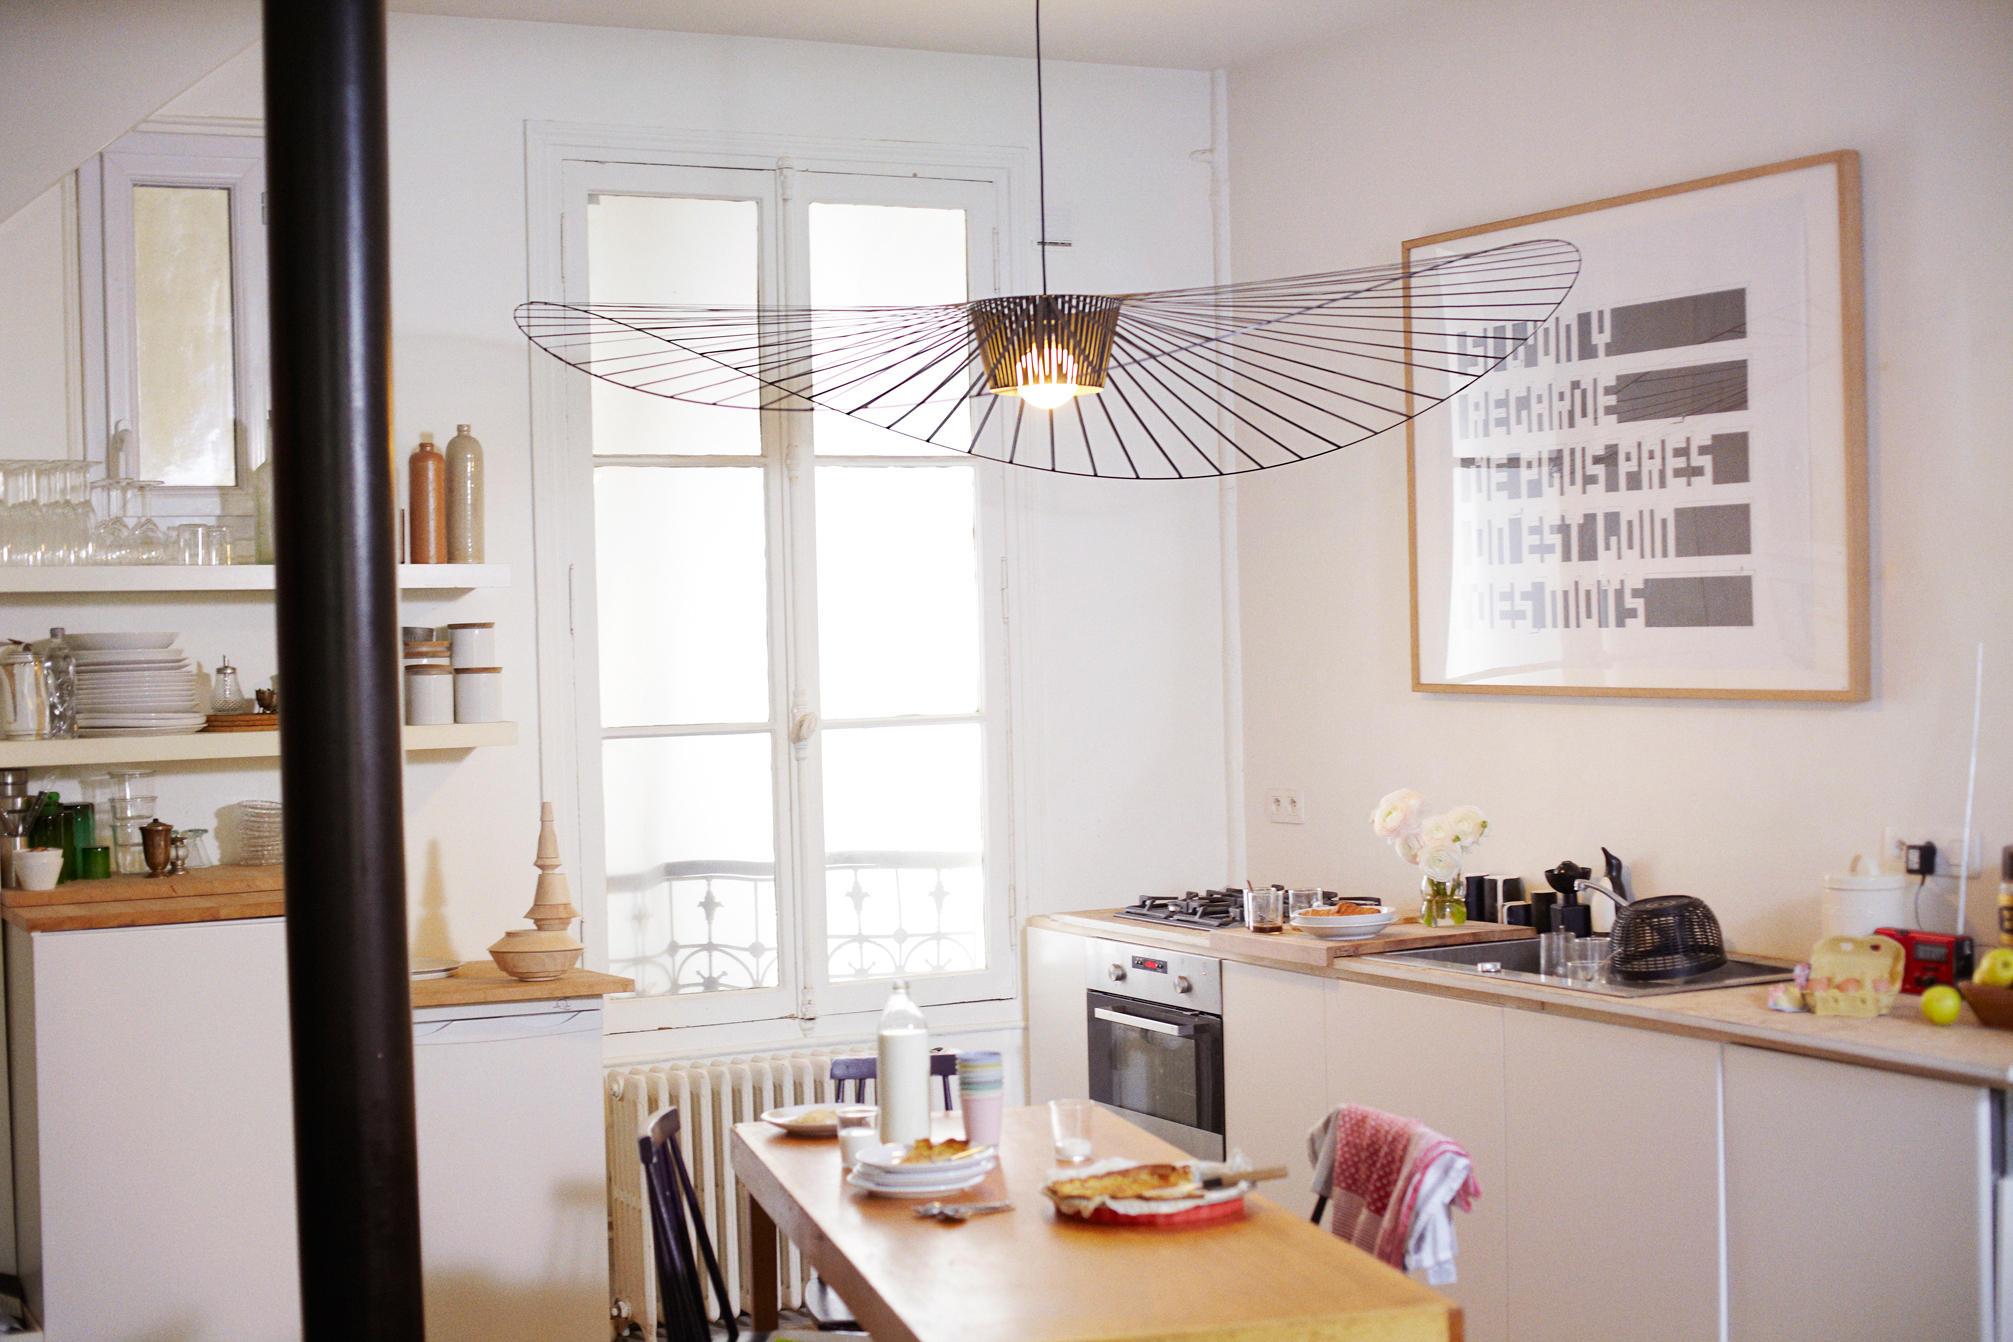 vertigo small general lighting from petite friture. Black Bedroom Furniture Sets. Home Design Ideas